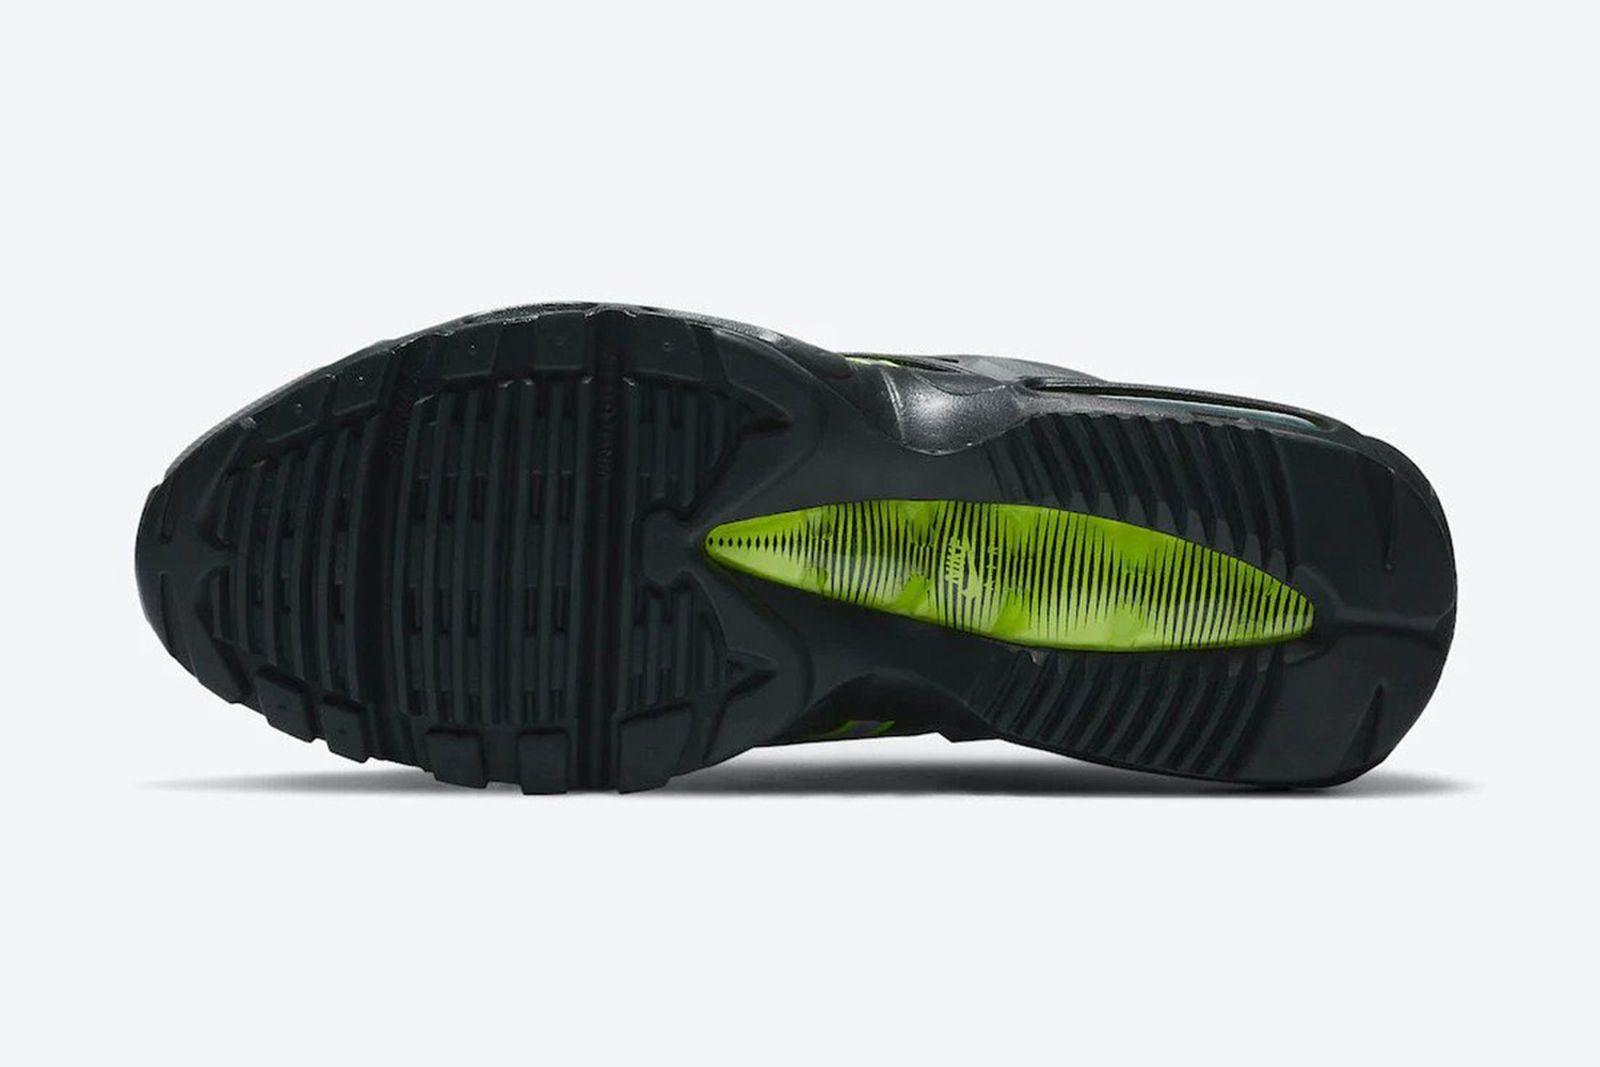 nike-air-max-95-ndstrkt-neon-release-date-price-09